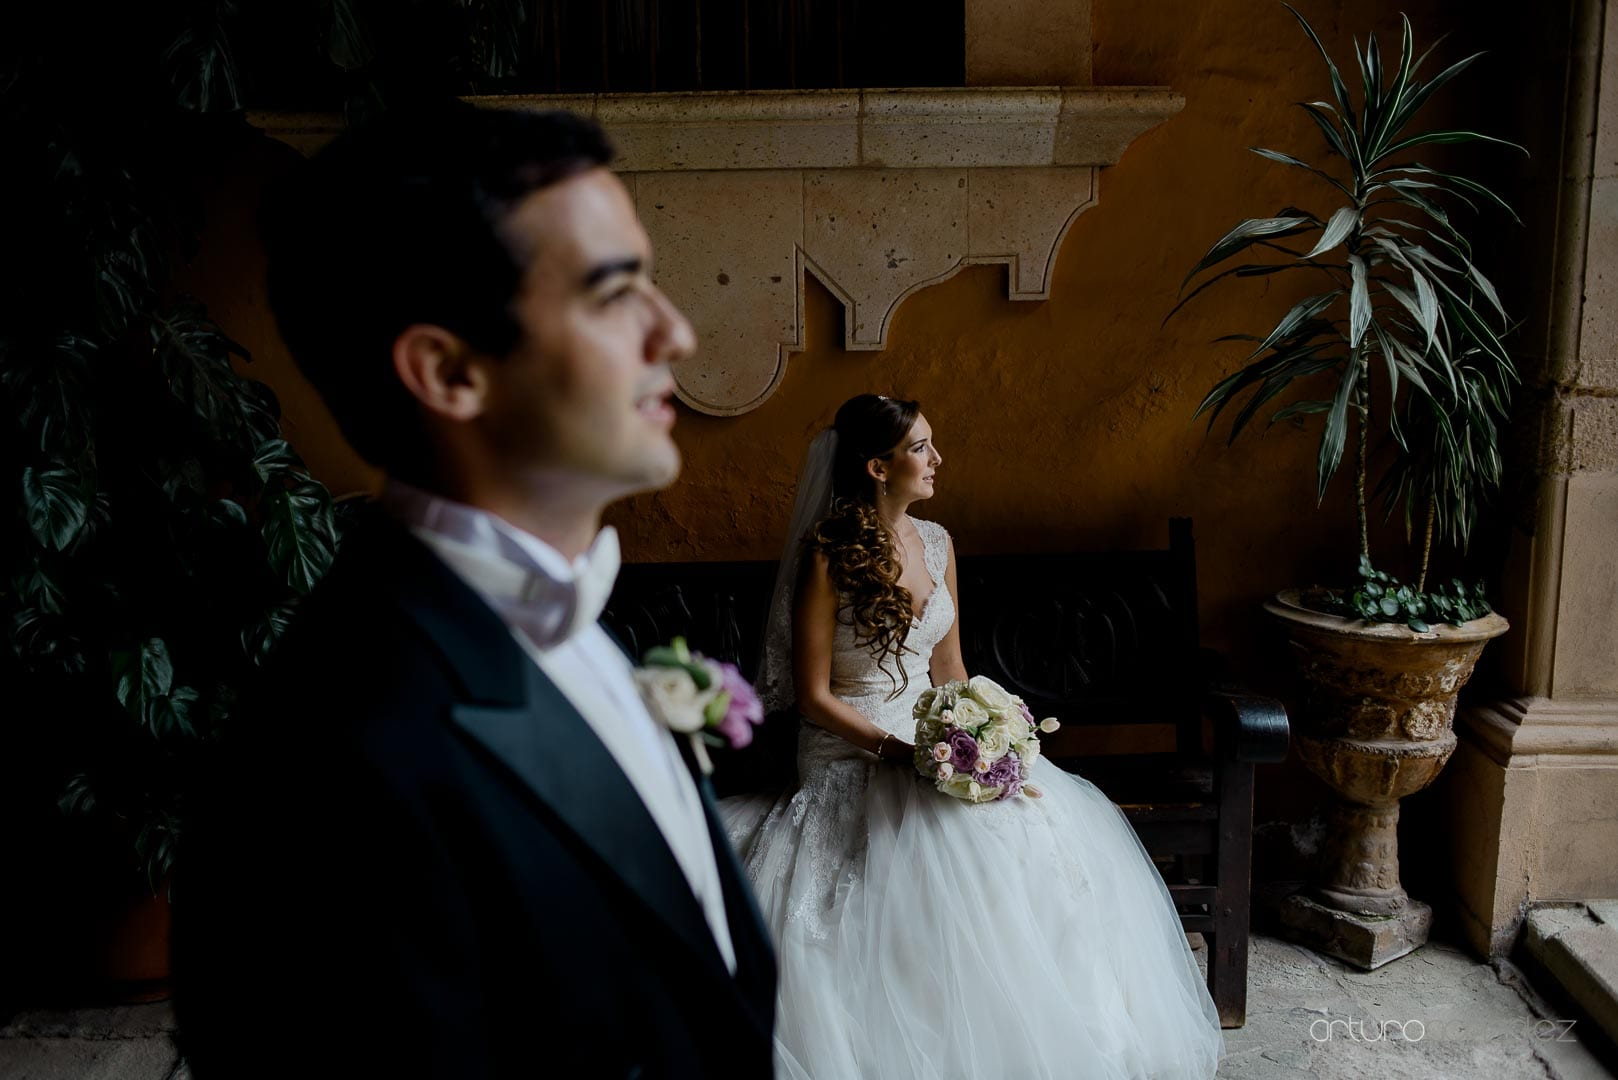 fotografo-de-bodas-en-guanajuato-28